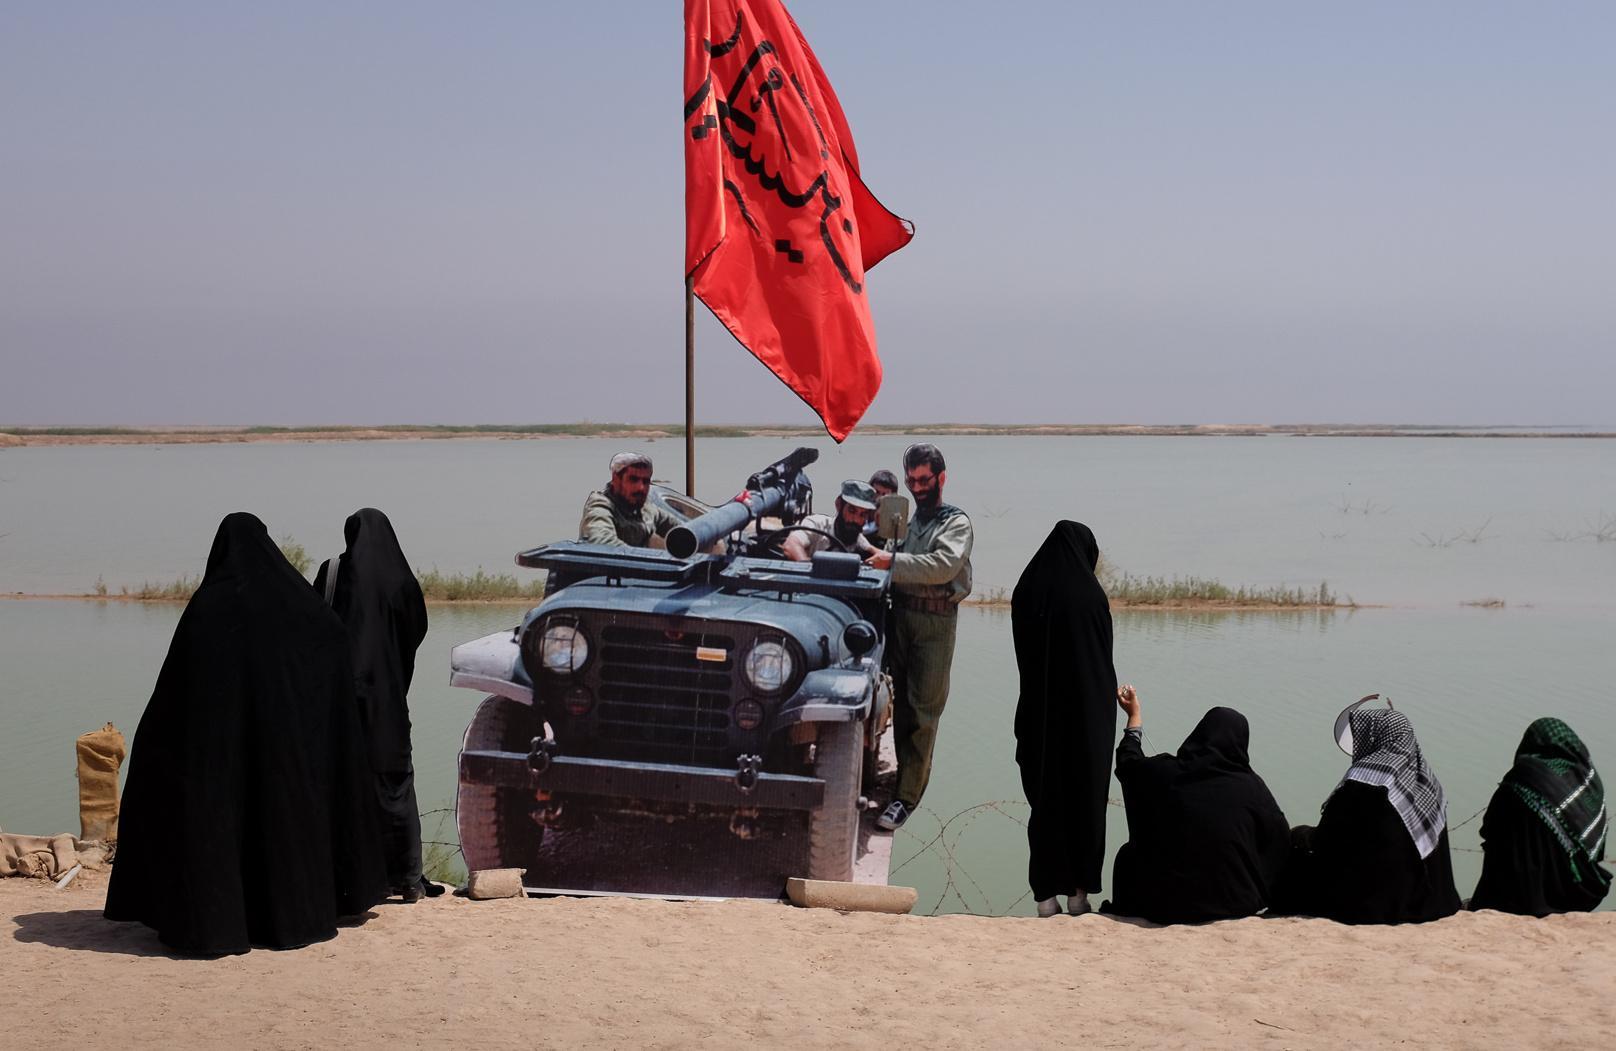 'Passengers of light' visit Iran-Iraq war memorials – a photo essay